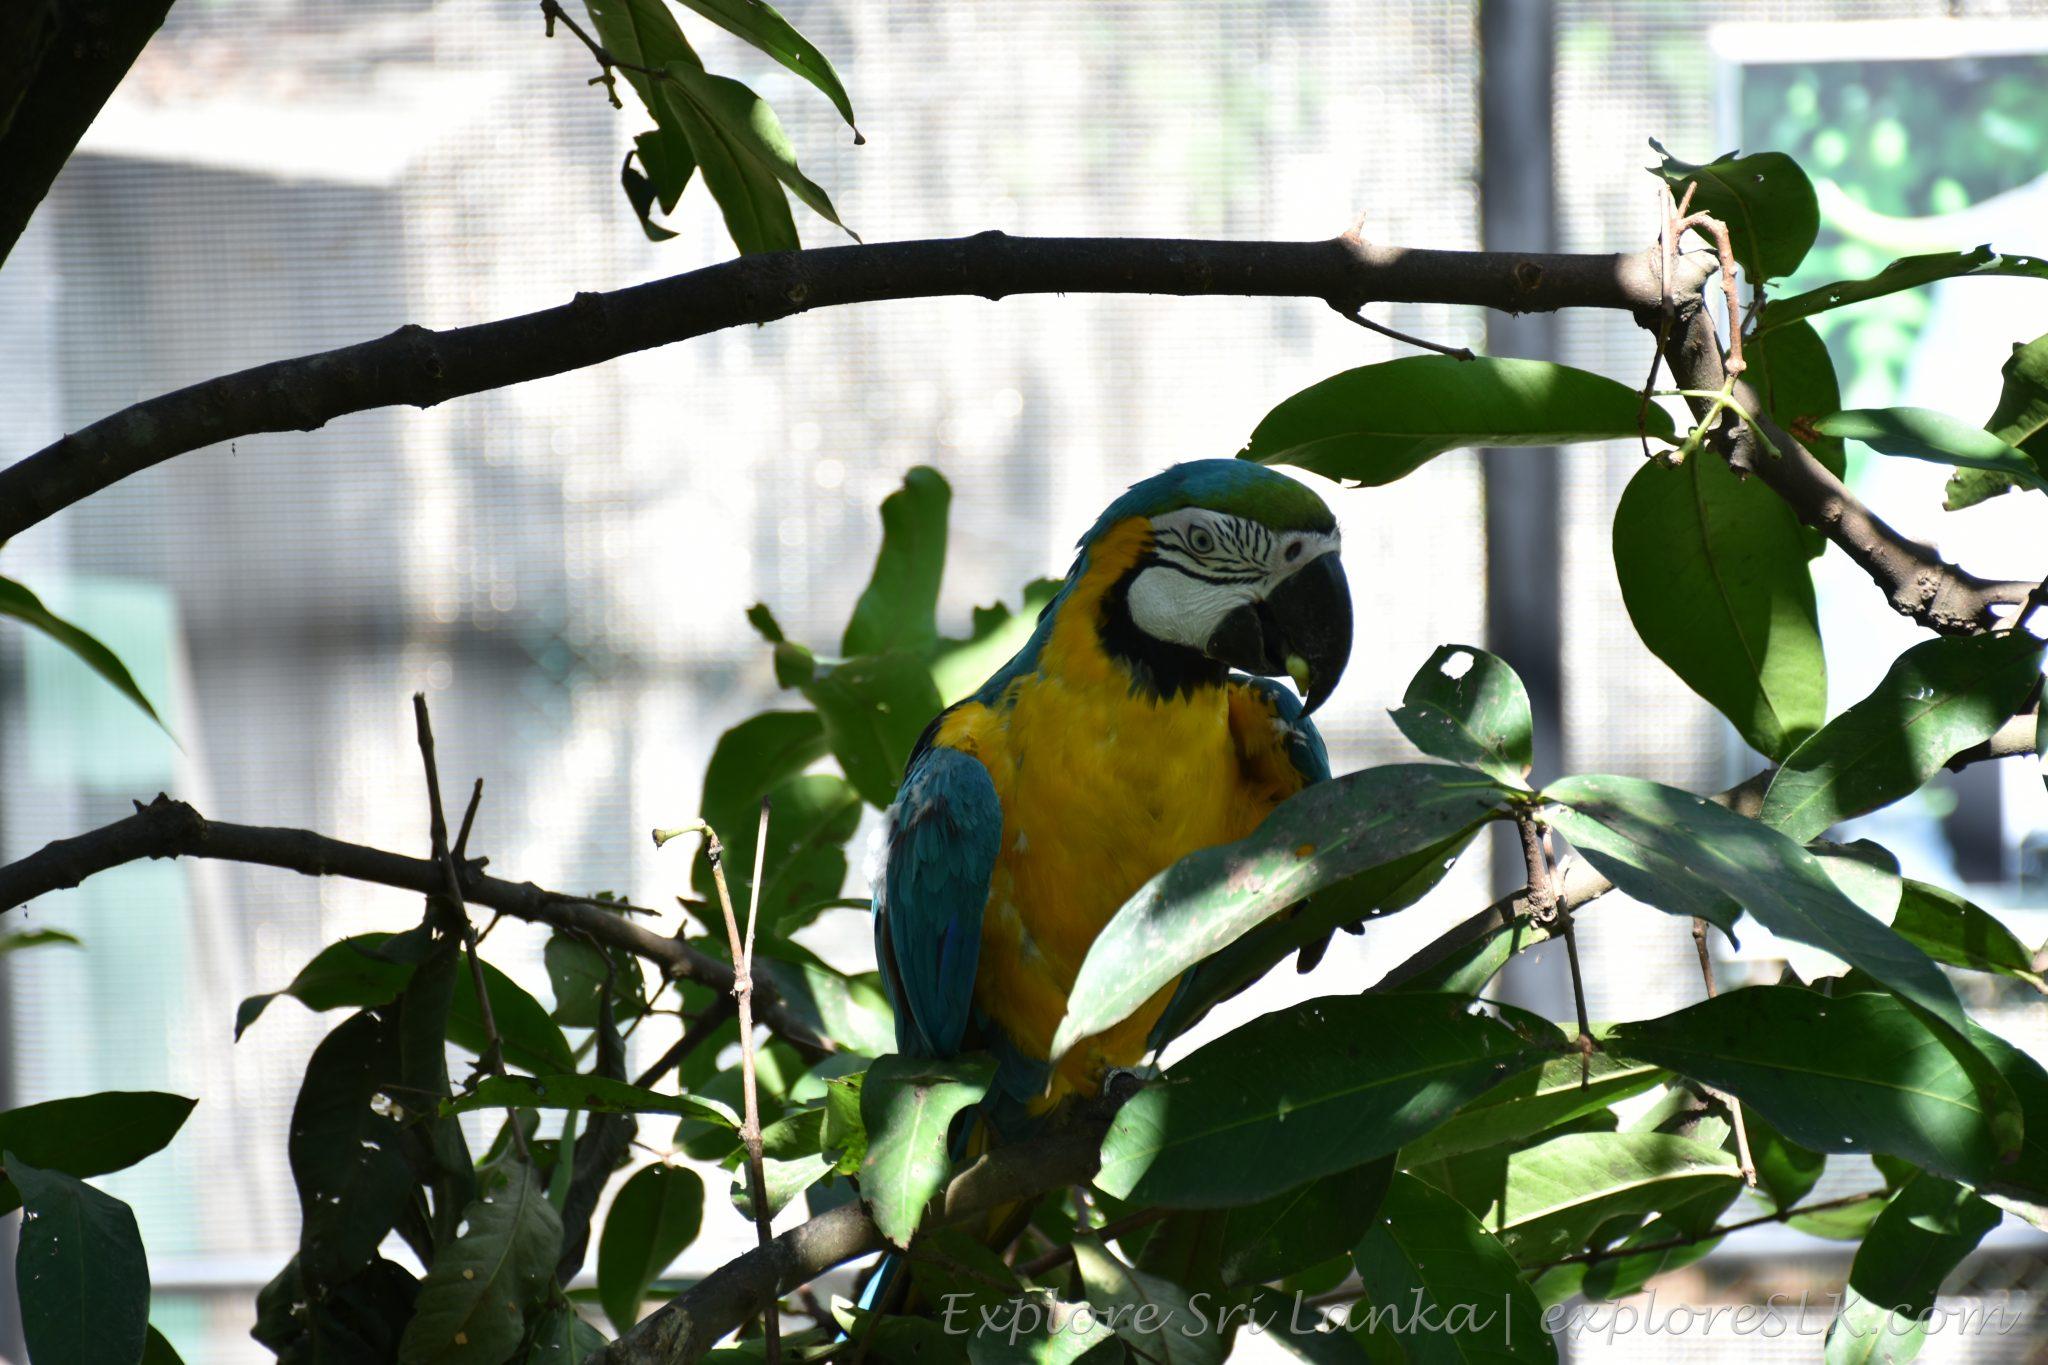 A macaw on tree